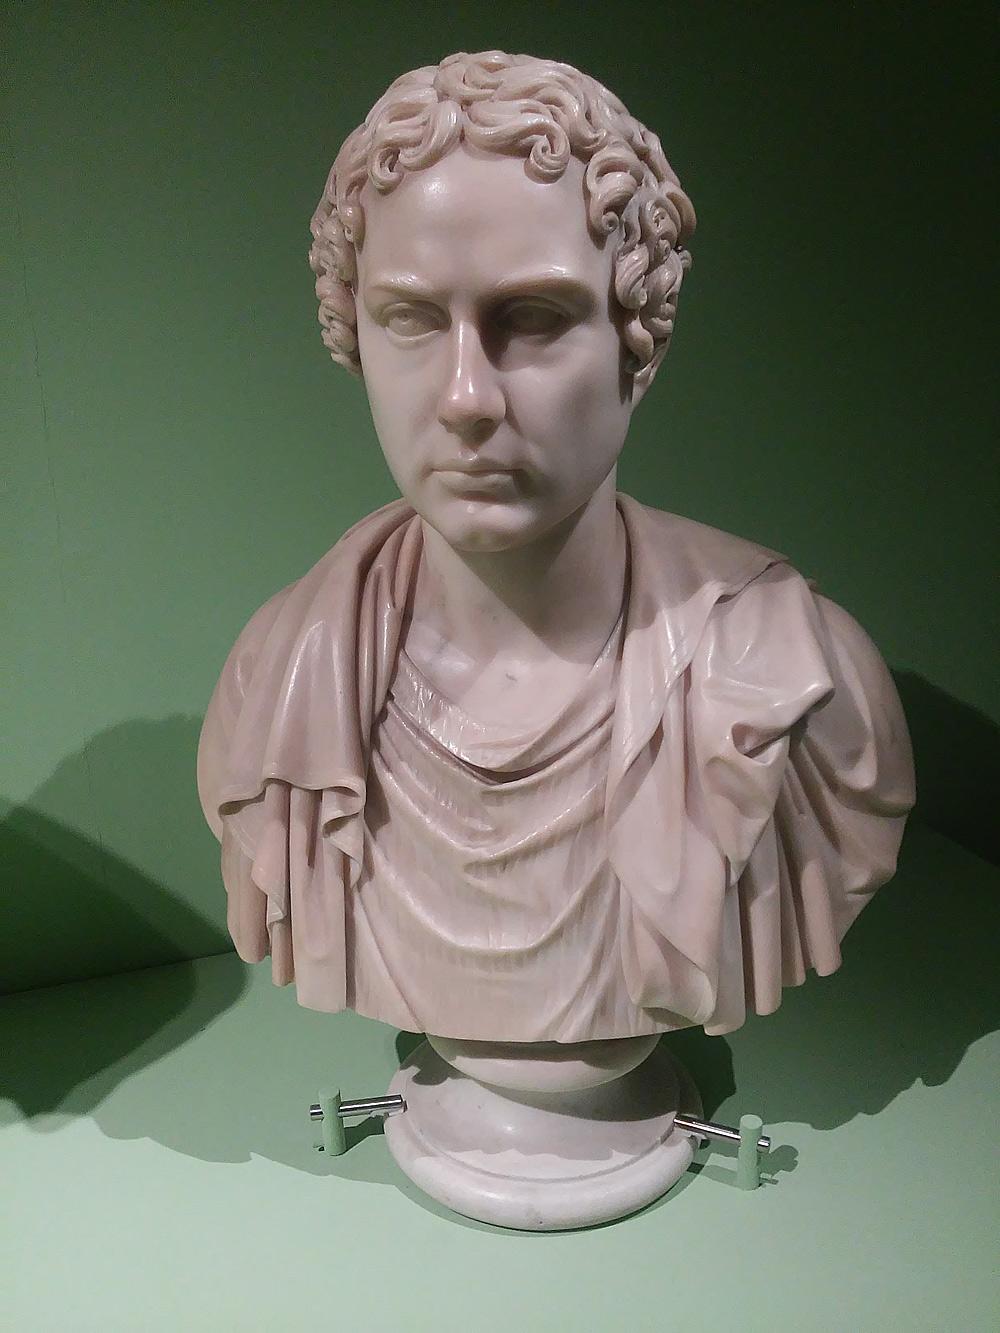 Bertel Thorvaldsen, Busto-ritratto di Lord Byron (1817-1833; marmo, 69 x 48 30 cm; Milano, Veneranda Biblioteca Ambrosiana)